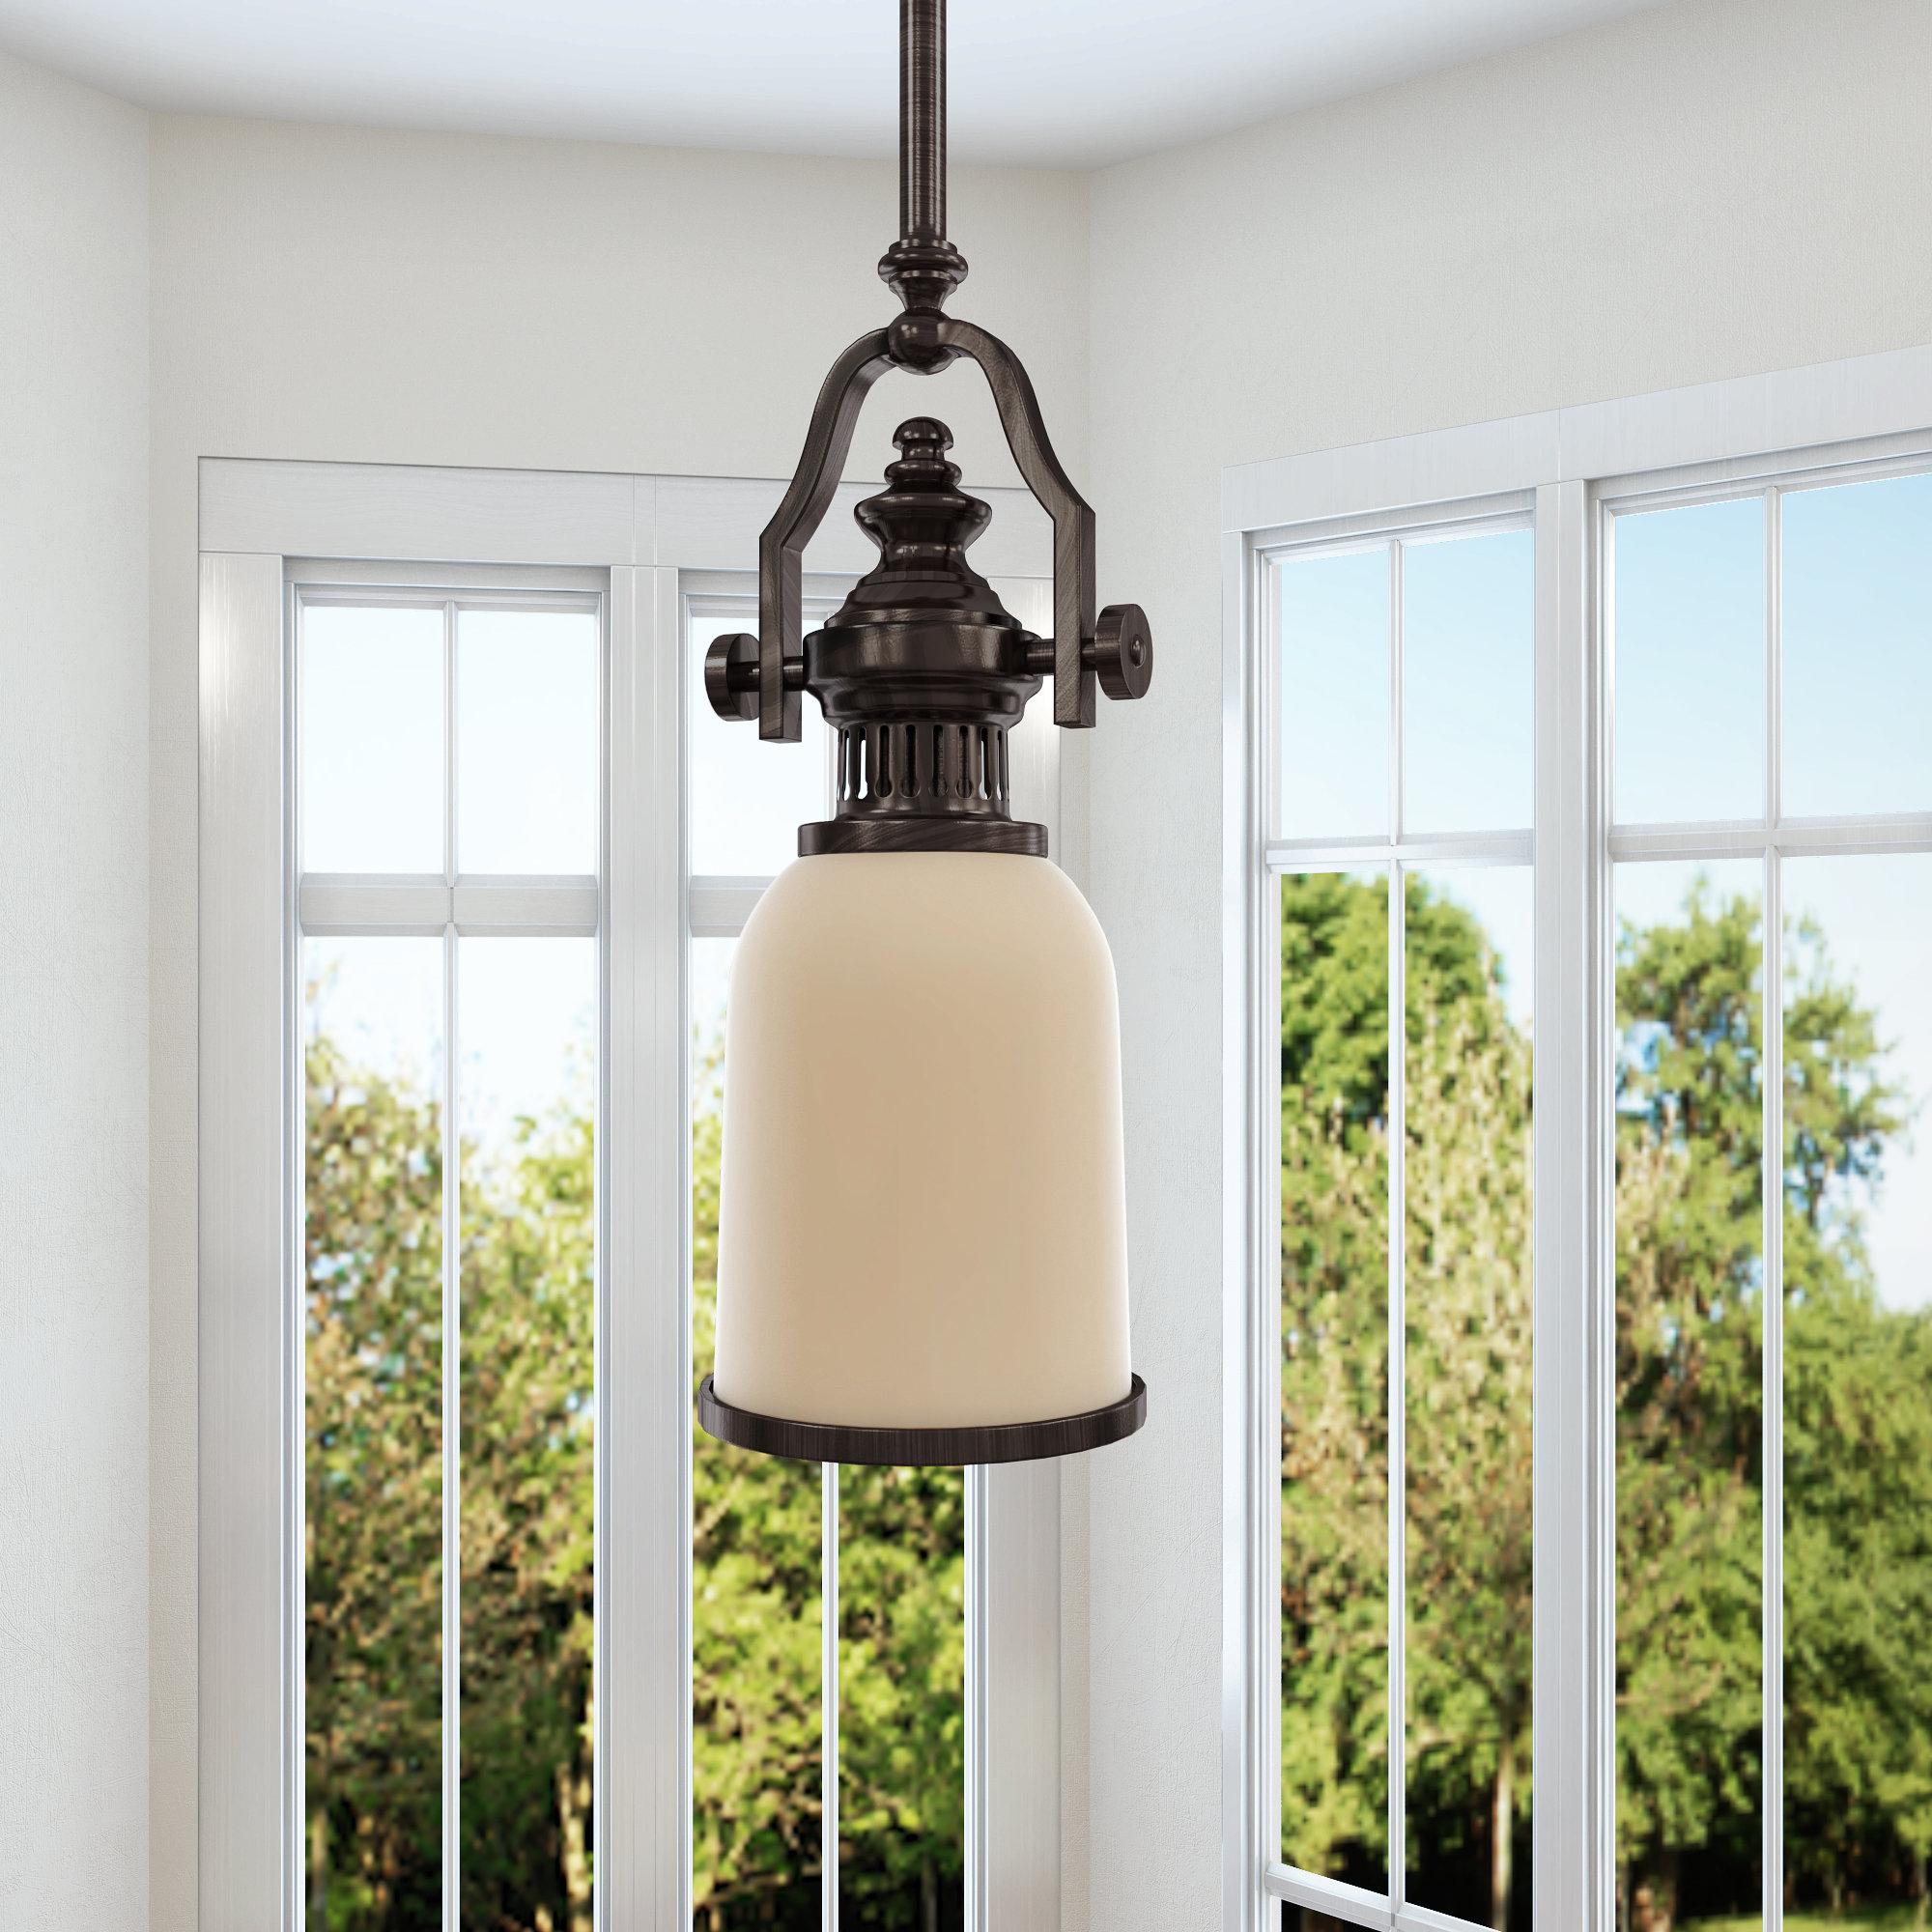 Erico 1 Light Single Bell Pendants With Regard To Recent Susan 1 Light Single Bell Pendant (View 8 of 20)